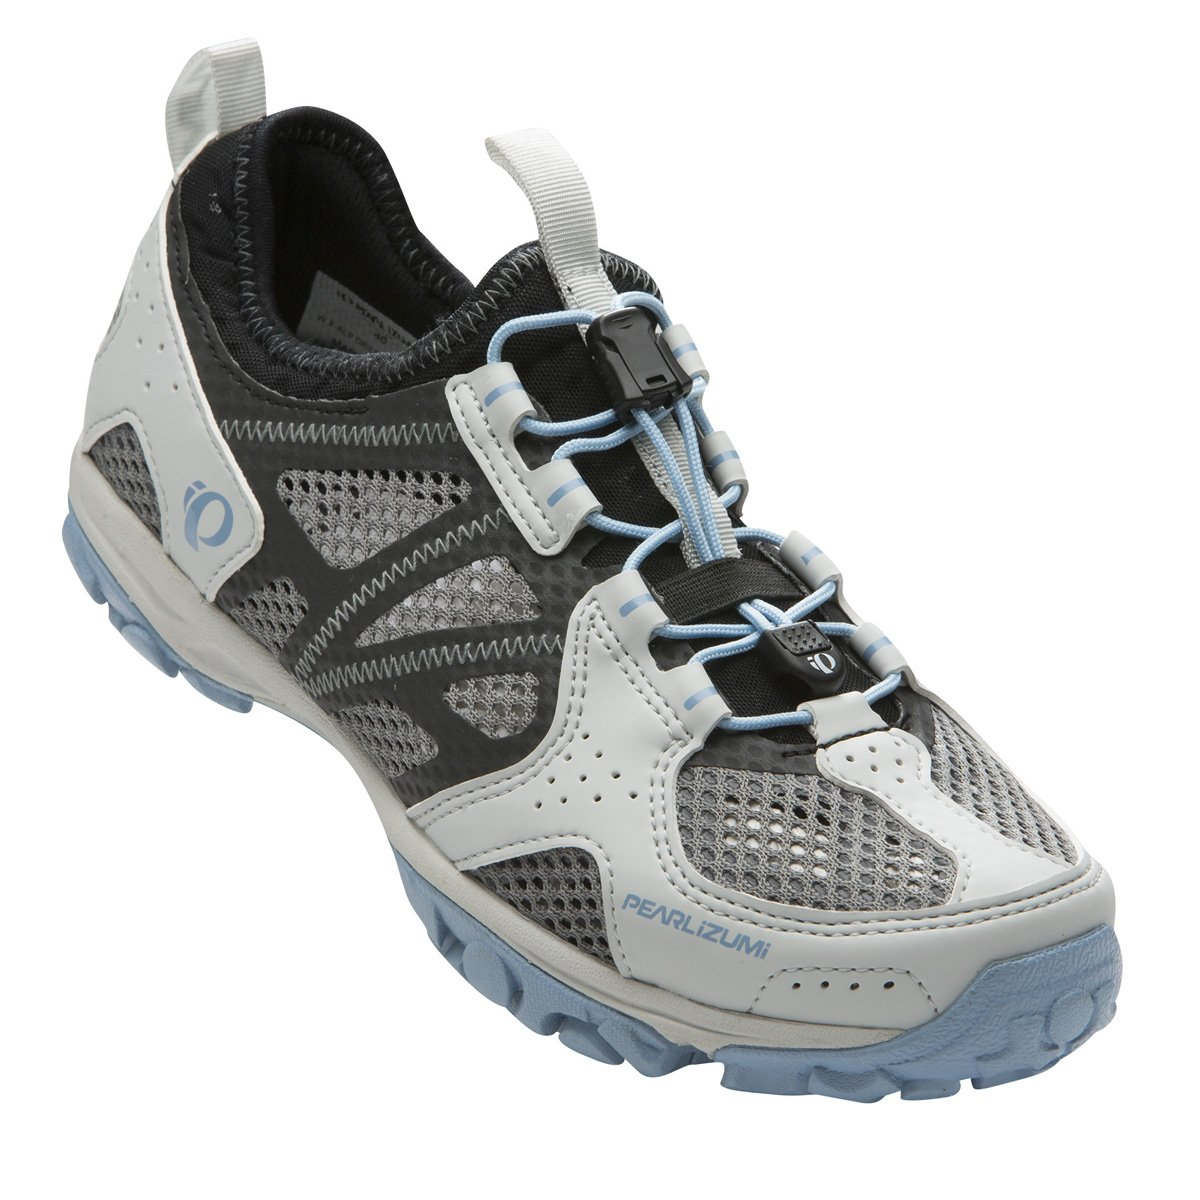 Pearl Izumi Women's W X-ALP Drift IV Cycling Shoe, Black/Dusk Blue, 40 EU/8.3 B US